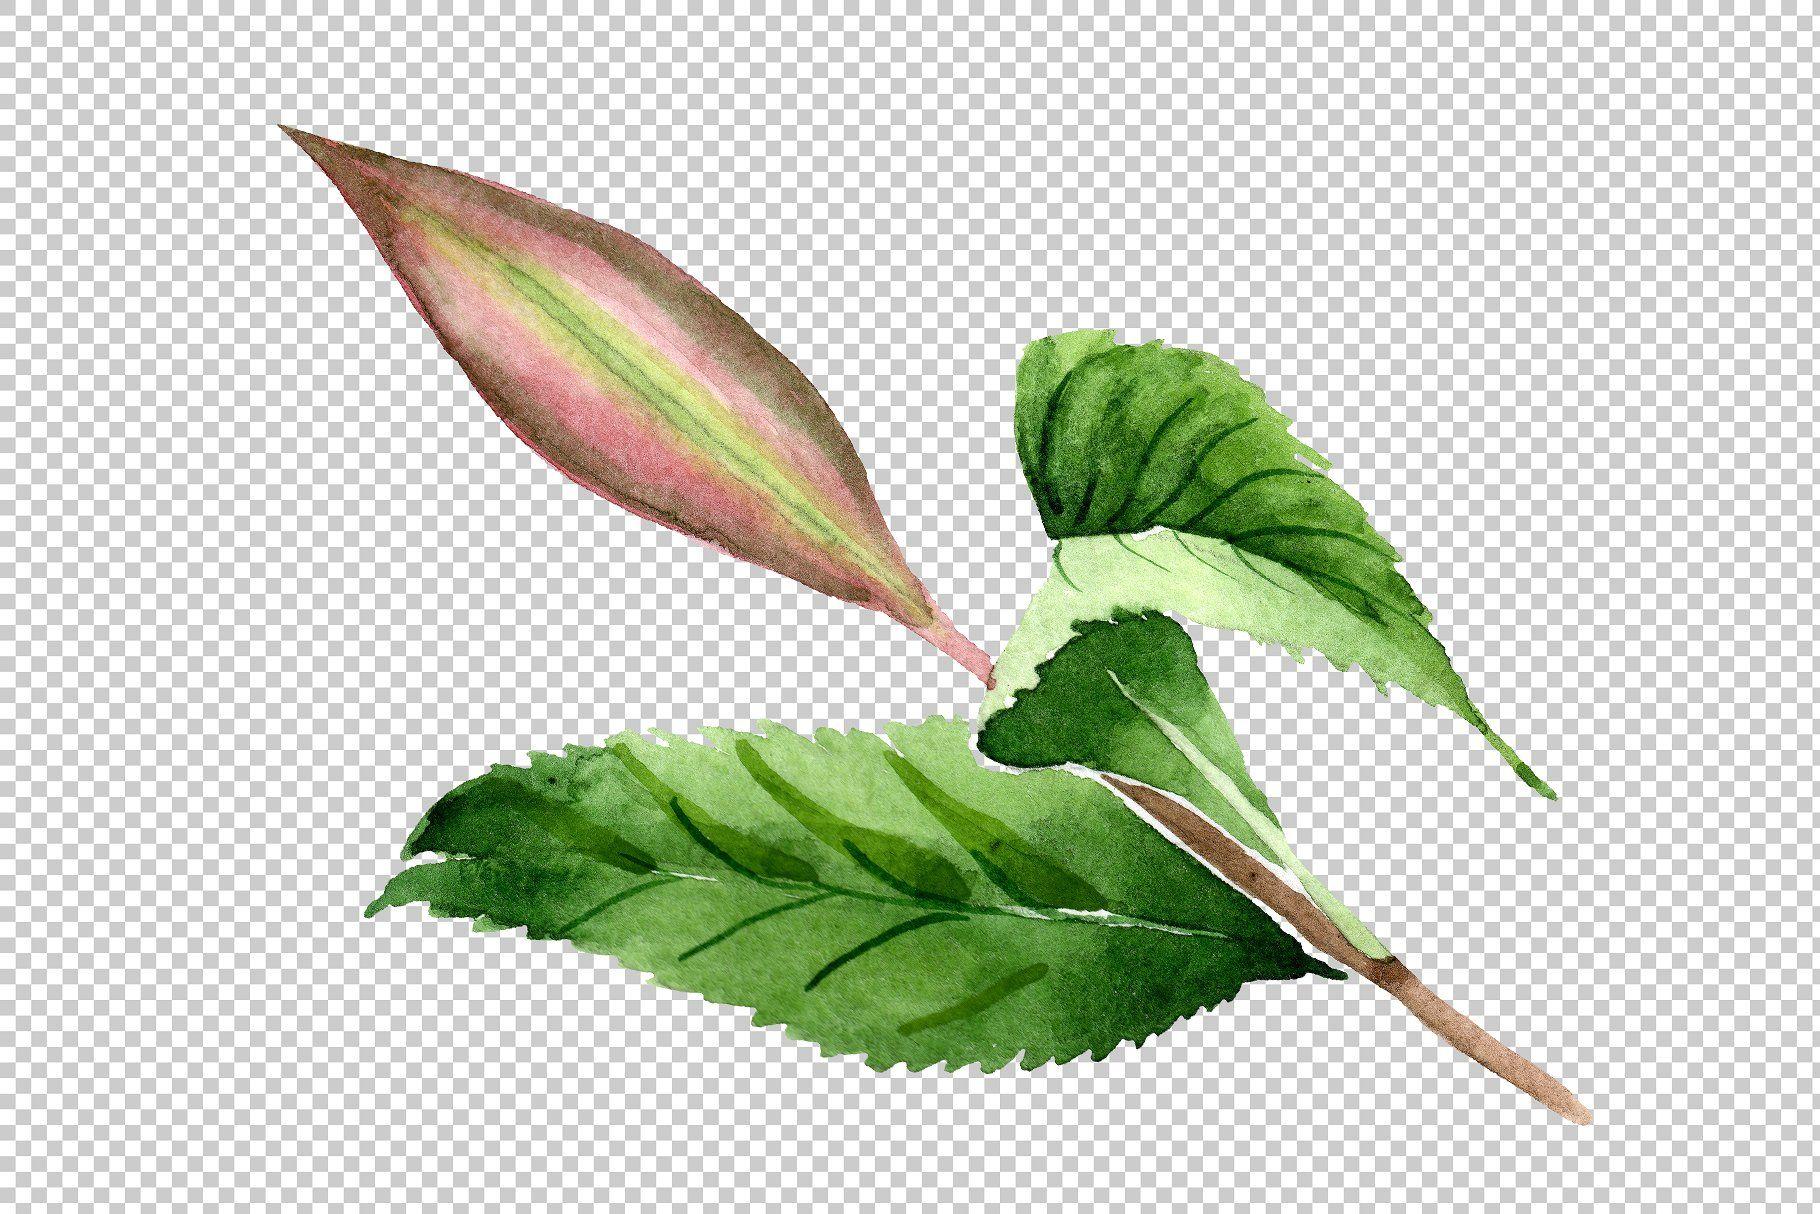 Tea Leaf Png Watercolor Set